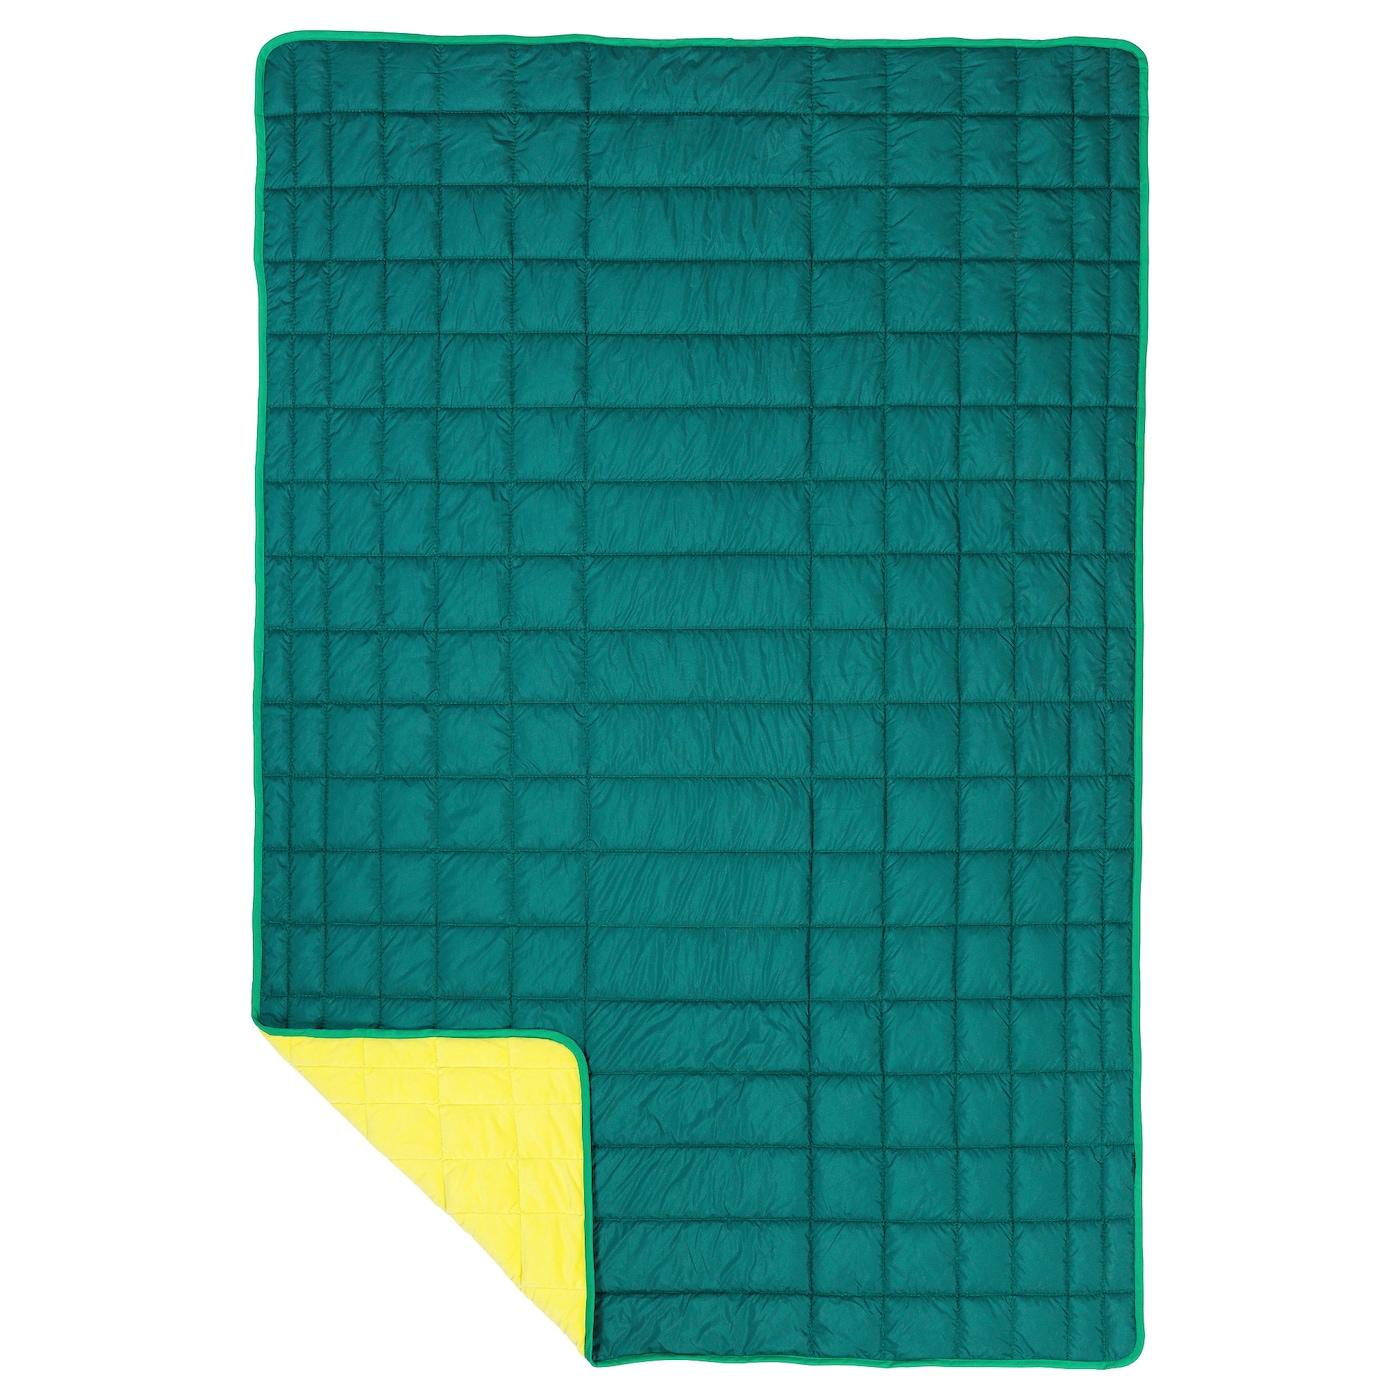 ikea ps 2017 throw green yellow 120x180 cm ikea. Black Bedroom Furniture Sets. Home Design Ideas